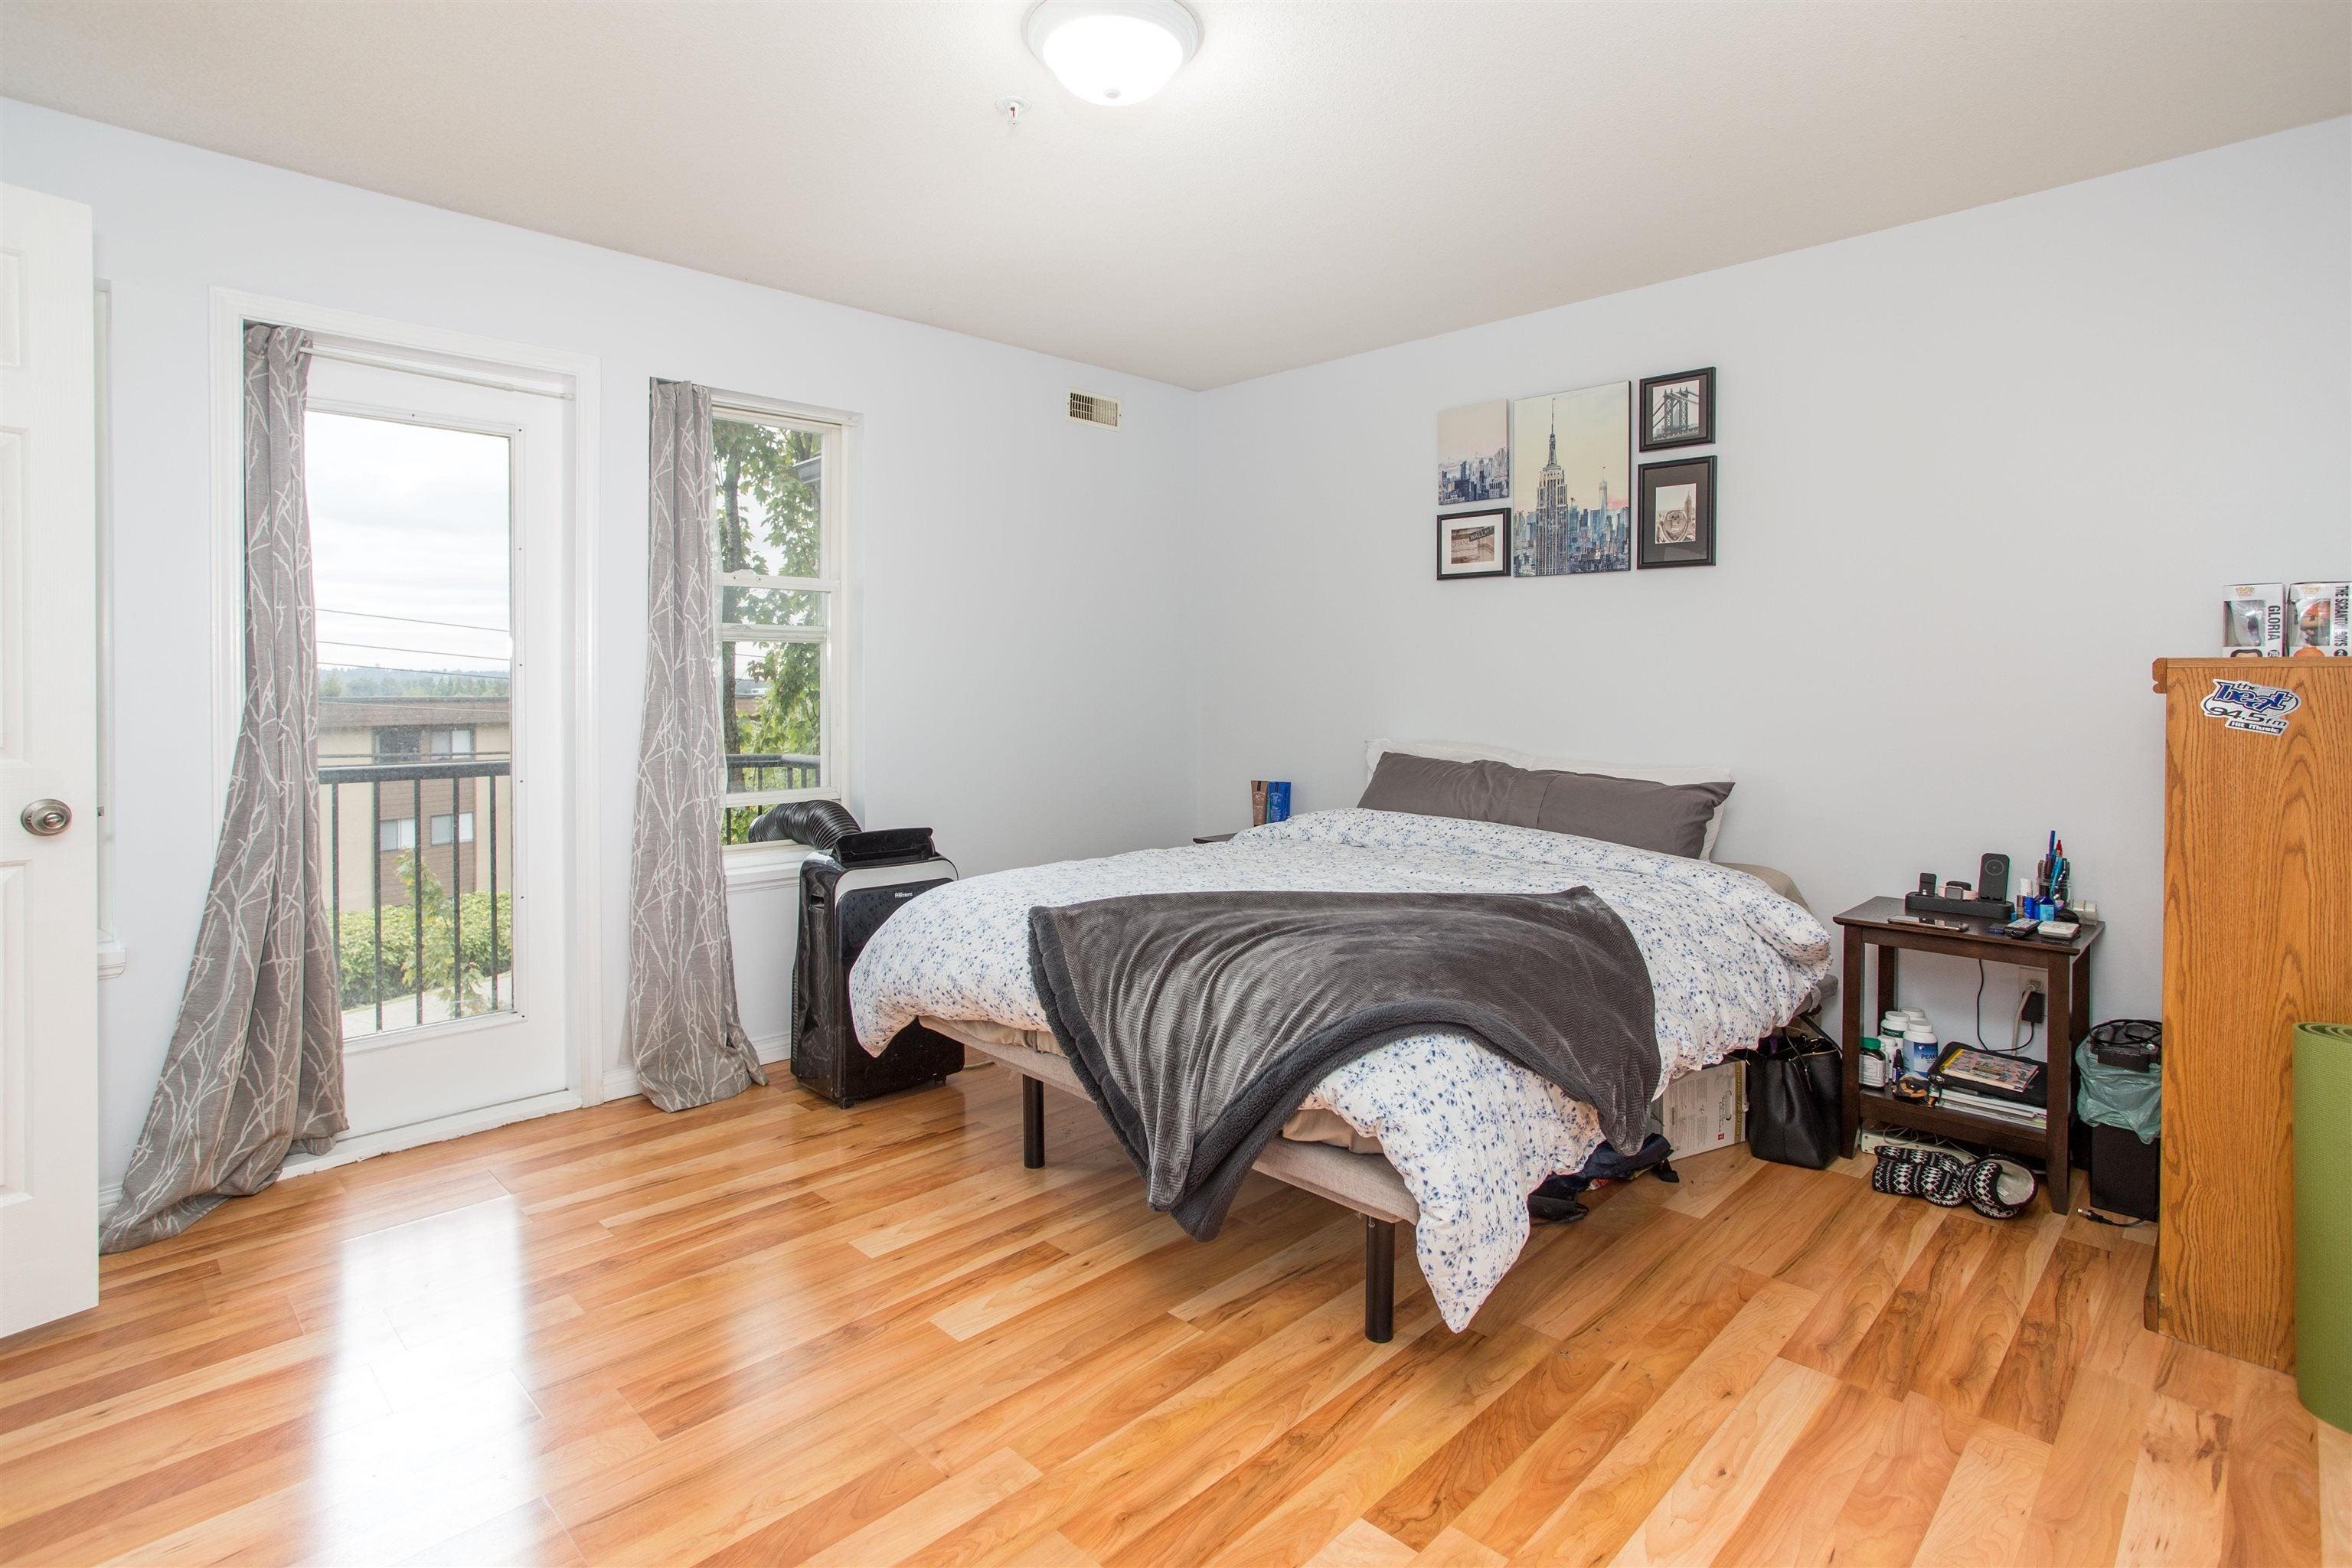 7 205 LEBLEU STREET - Maillardville Apartment/Condo for sale, 3 Bedrooms (R2625671) - #13